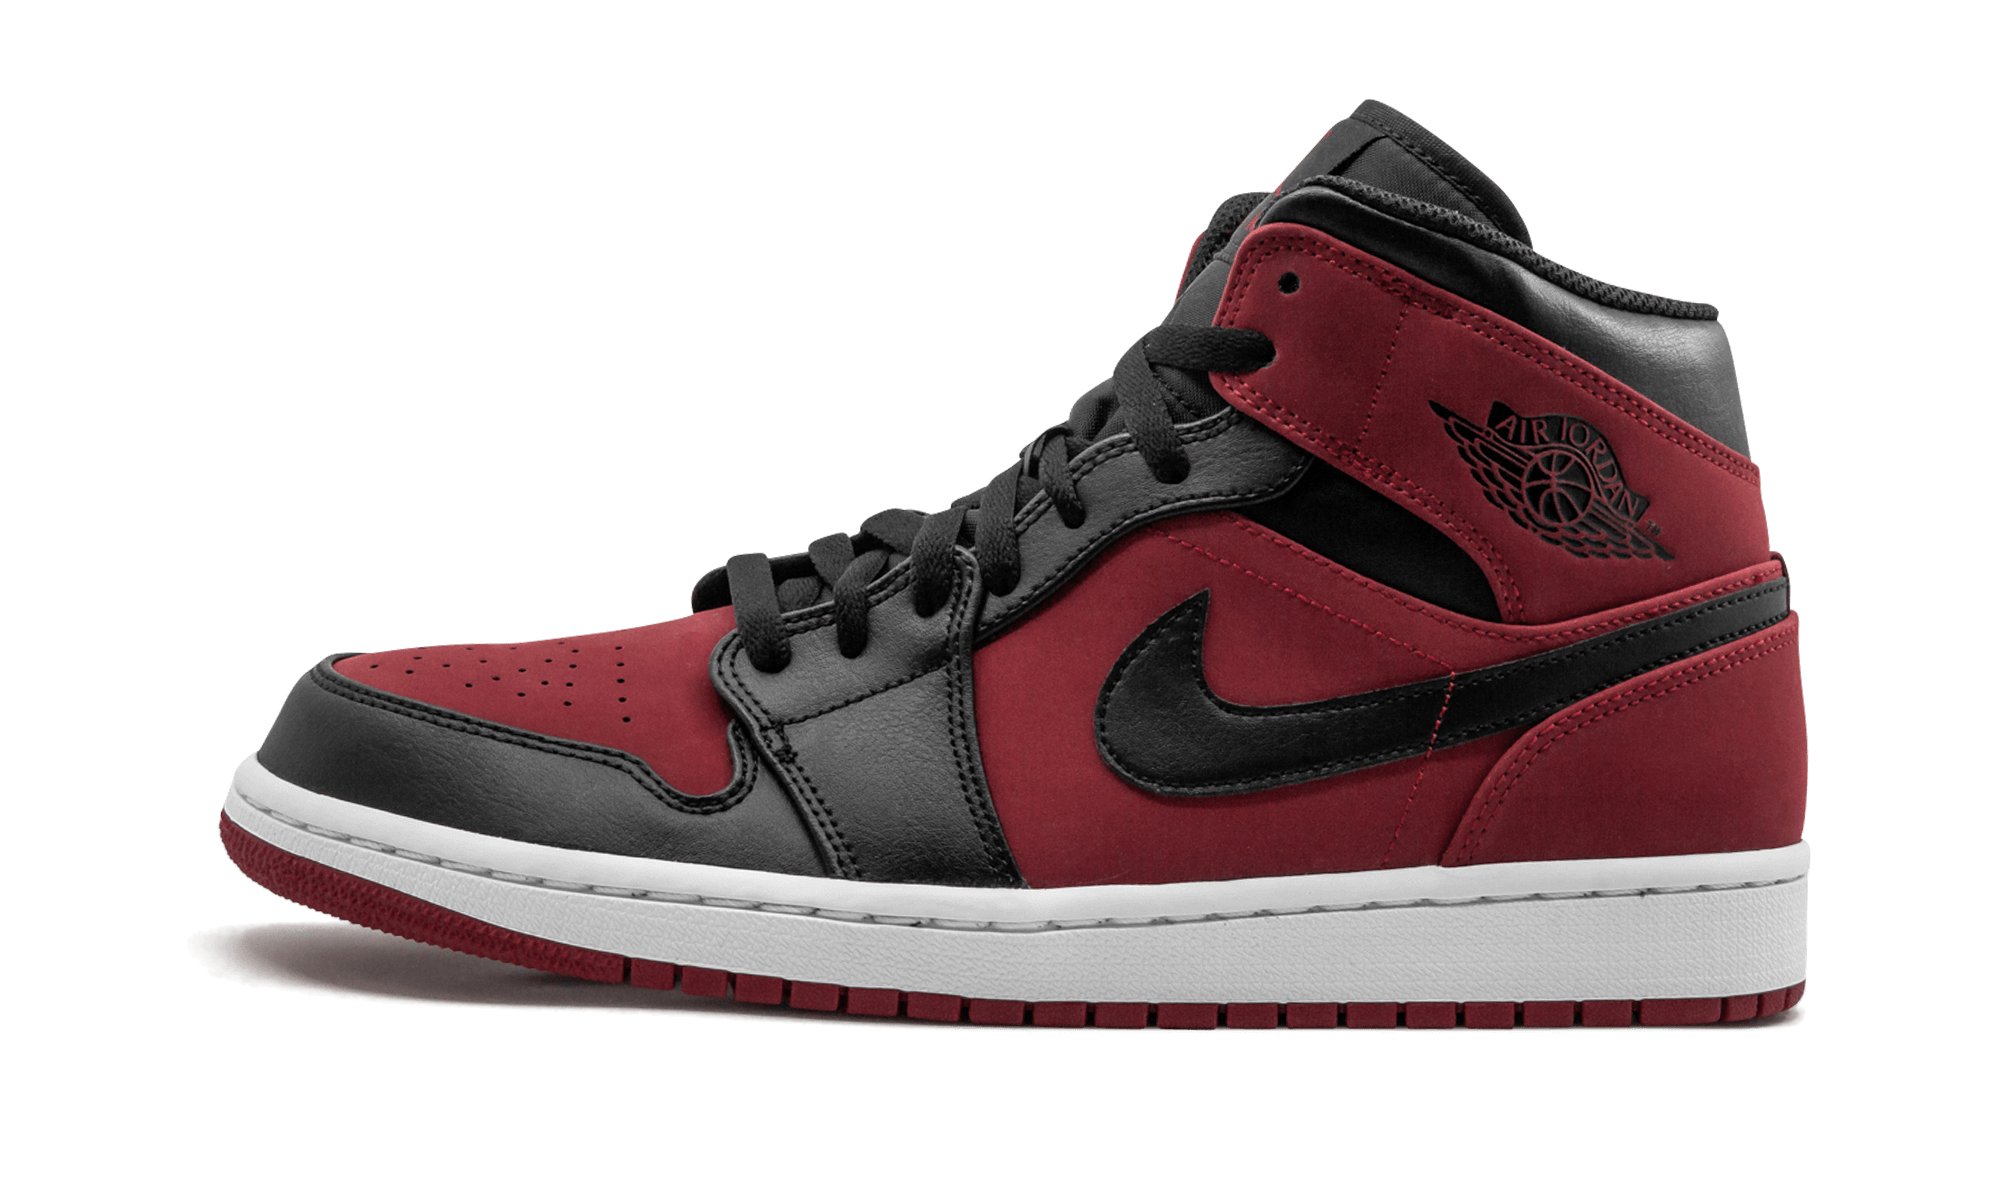 7f303036ee28ed Air Jordan 1 MID554724 610Air Jordan 1 MIDSKU  554724 610Color  Black   Red   nike  jordan  jordanair5retro  royalblueshoes  sneakers  fashionsneakers  ...